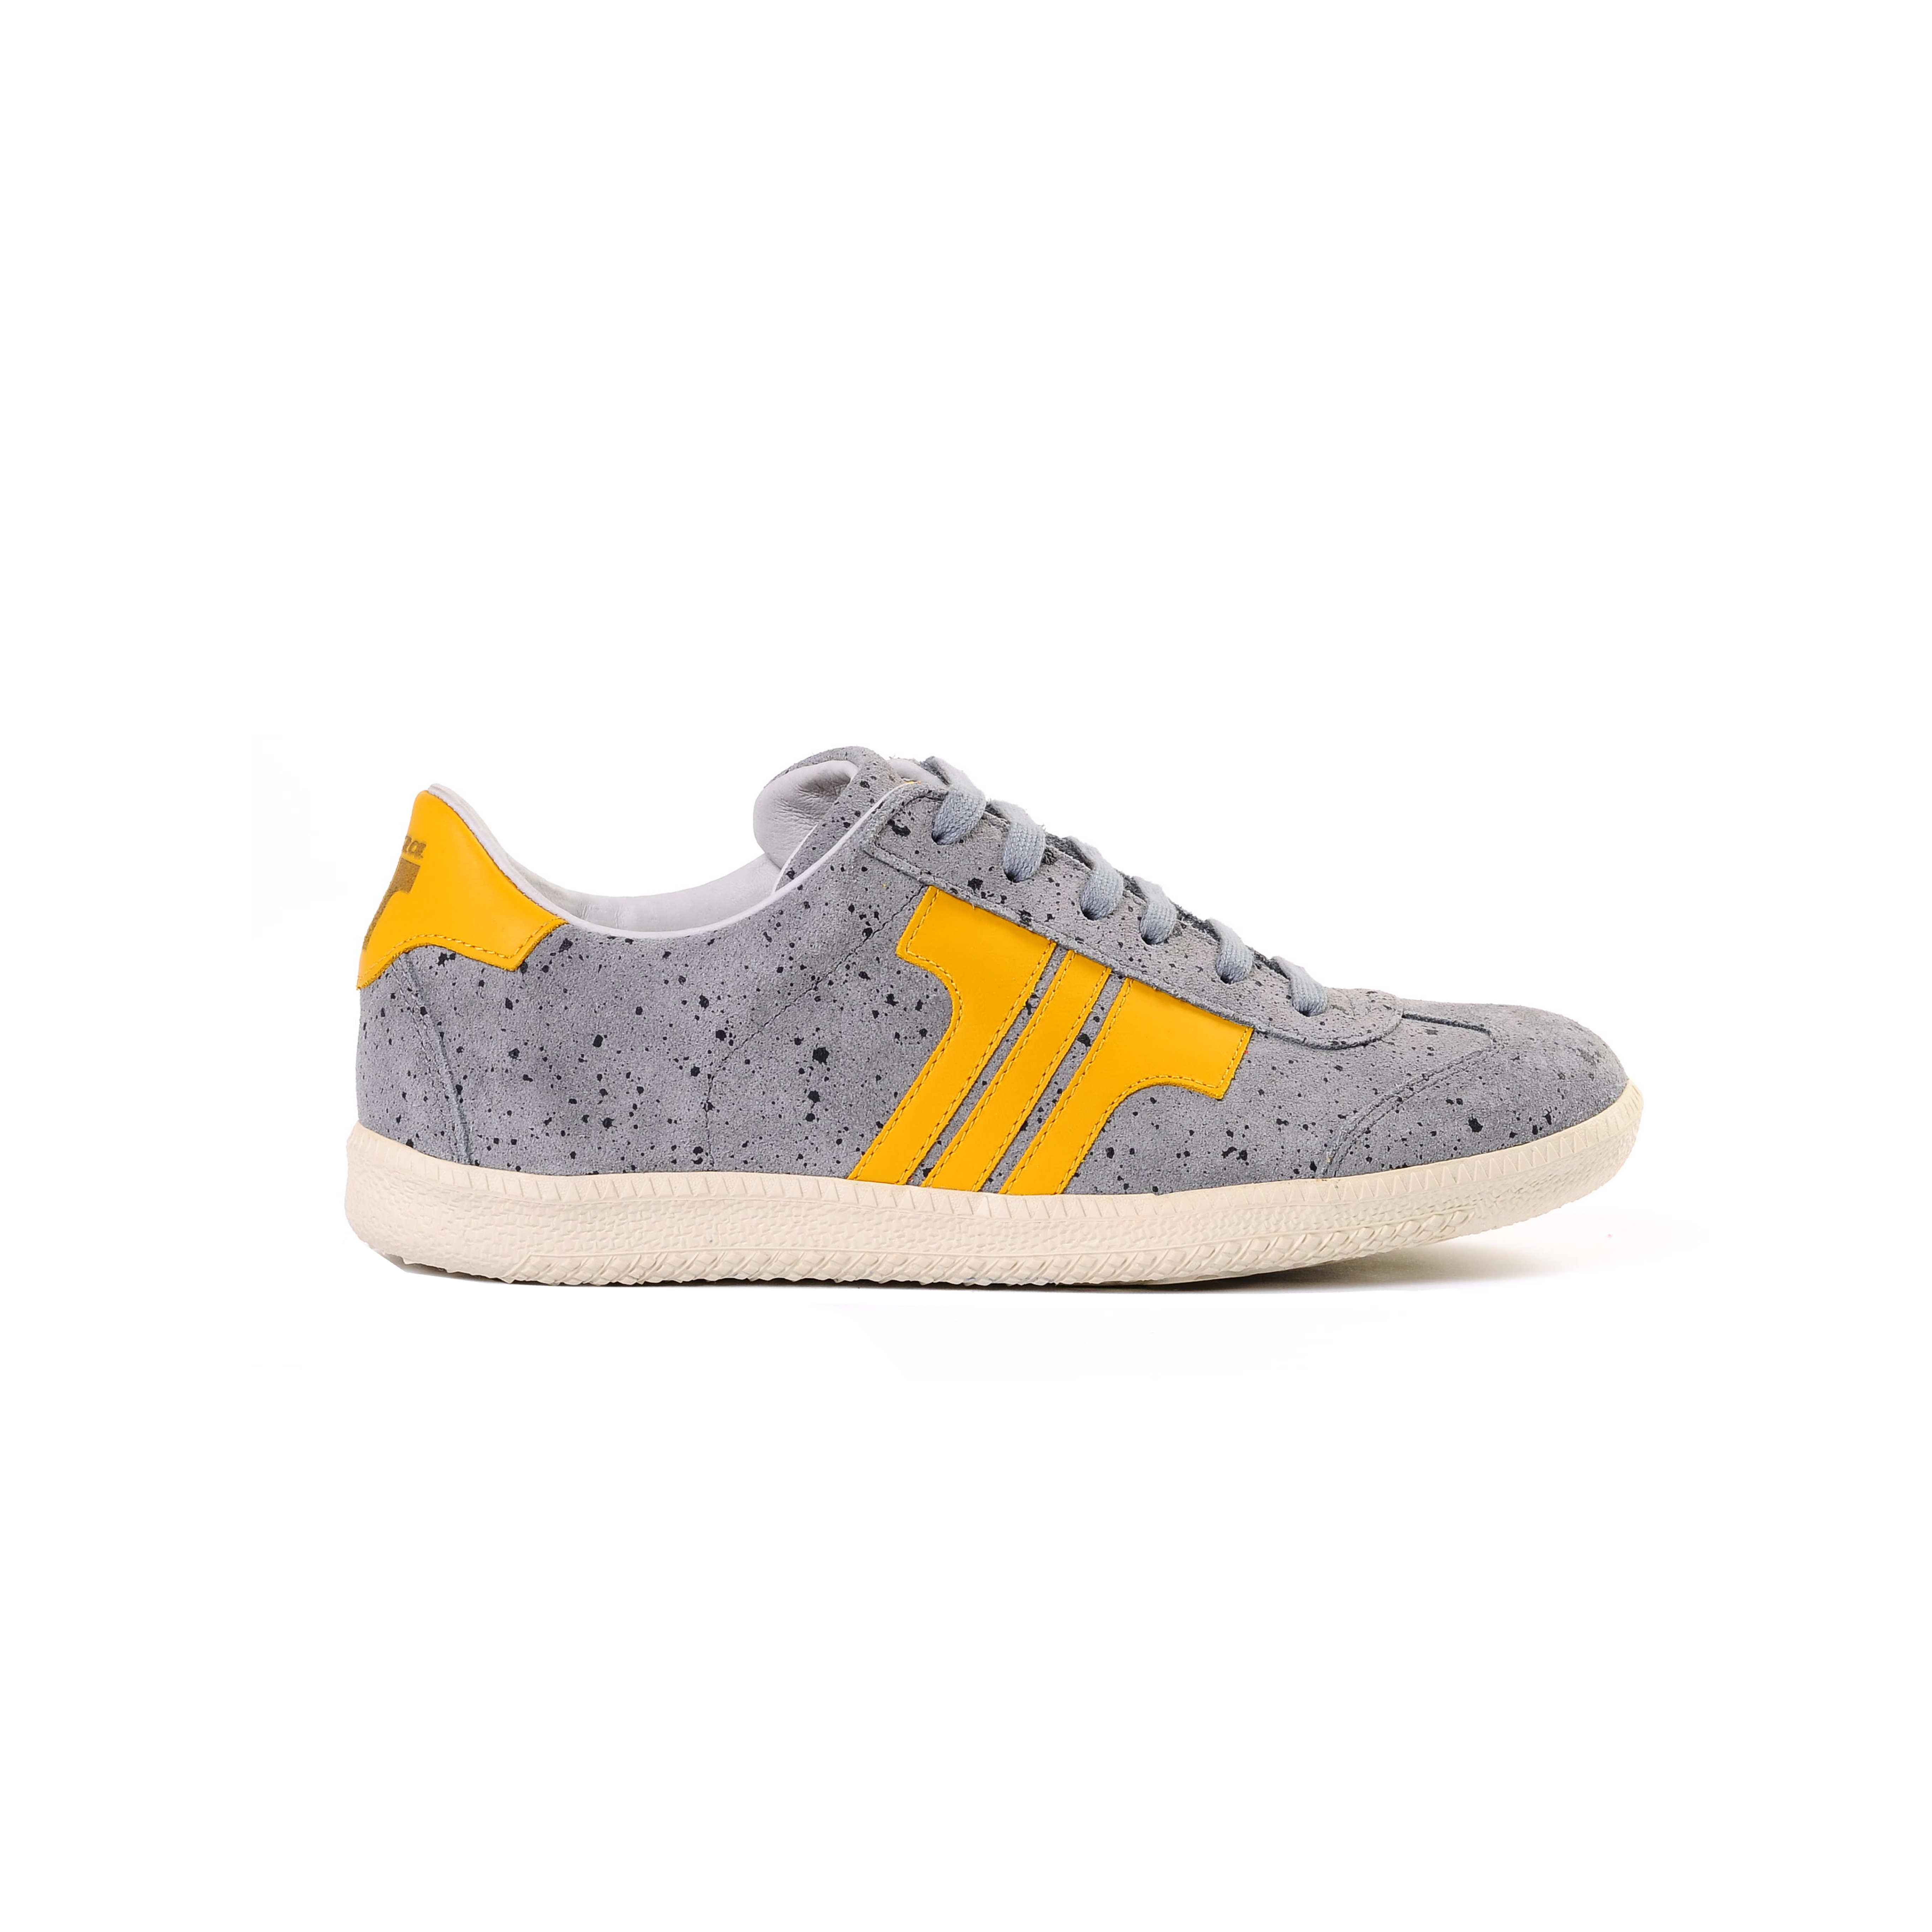 Tisza shoes - Comfort - Grey-splash yellow